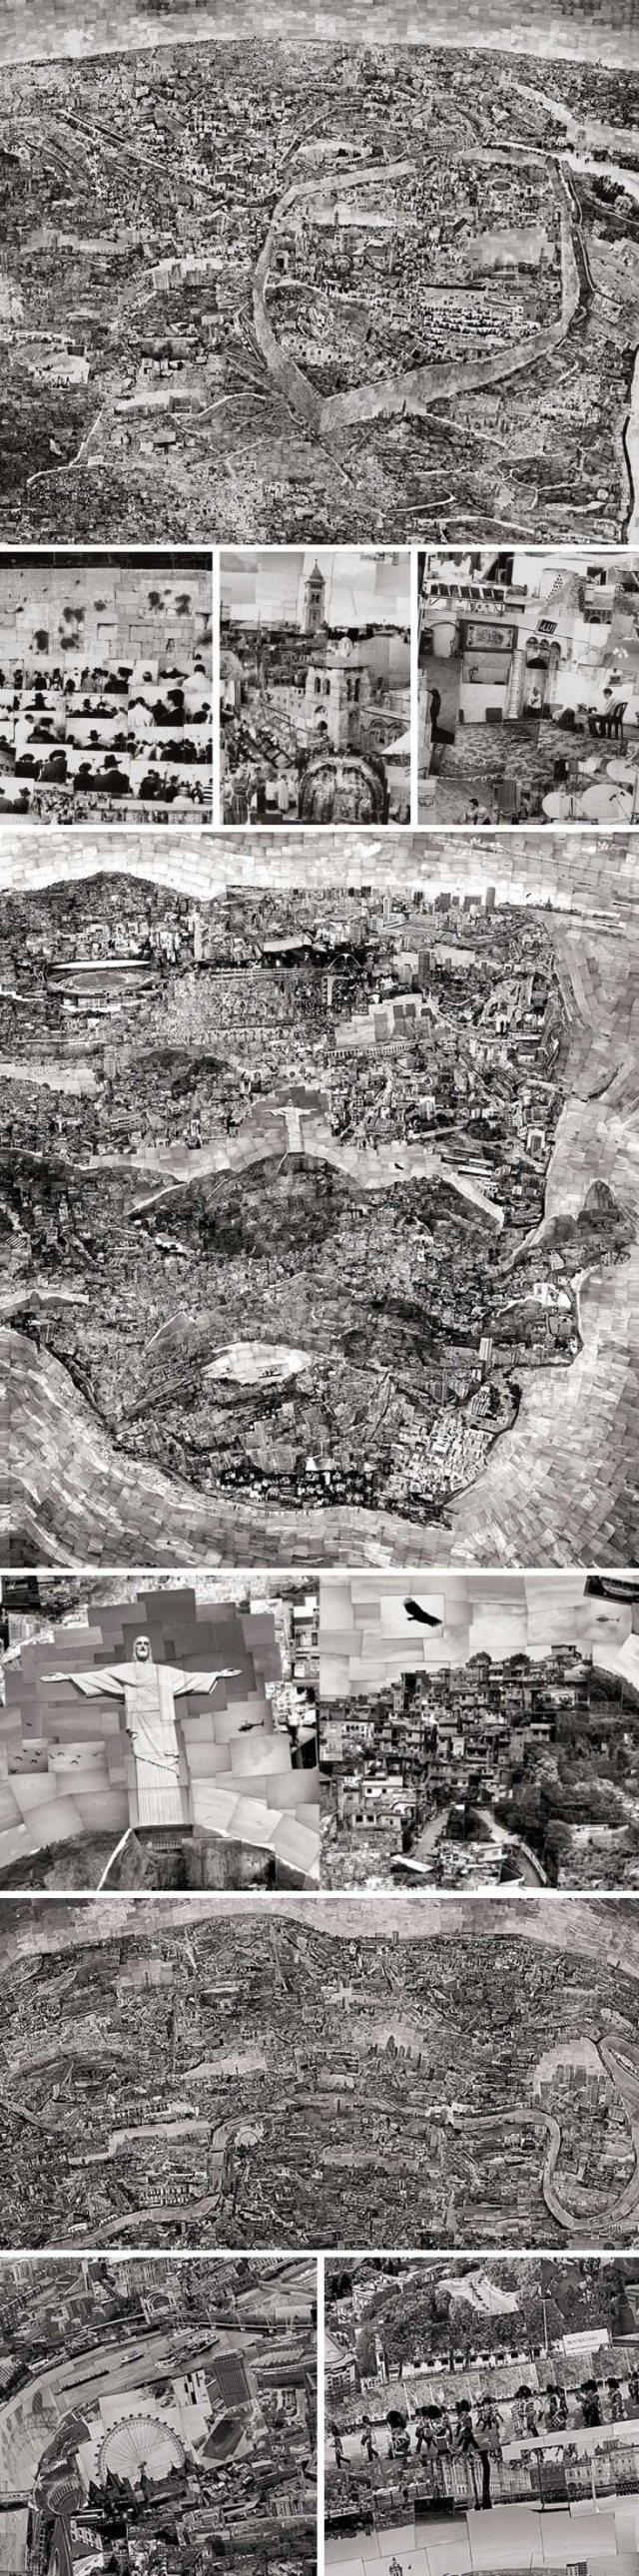 sohei-nishino_diorama-maps_collabcubed